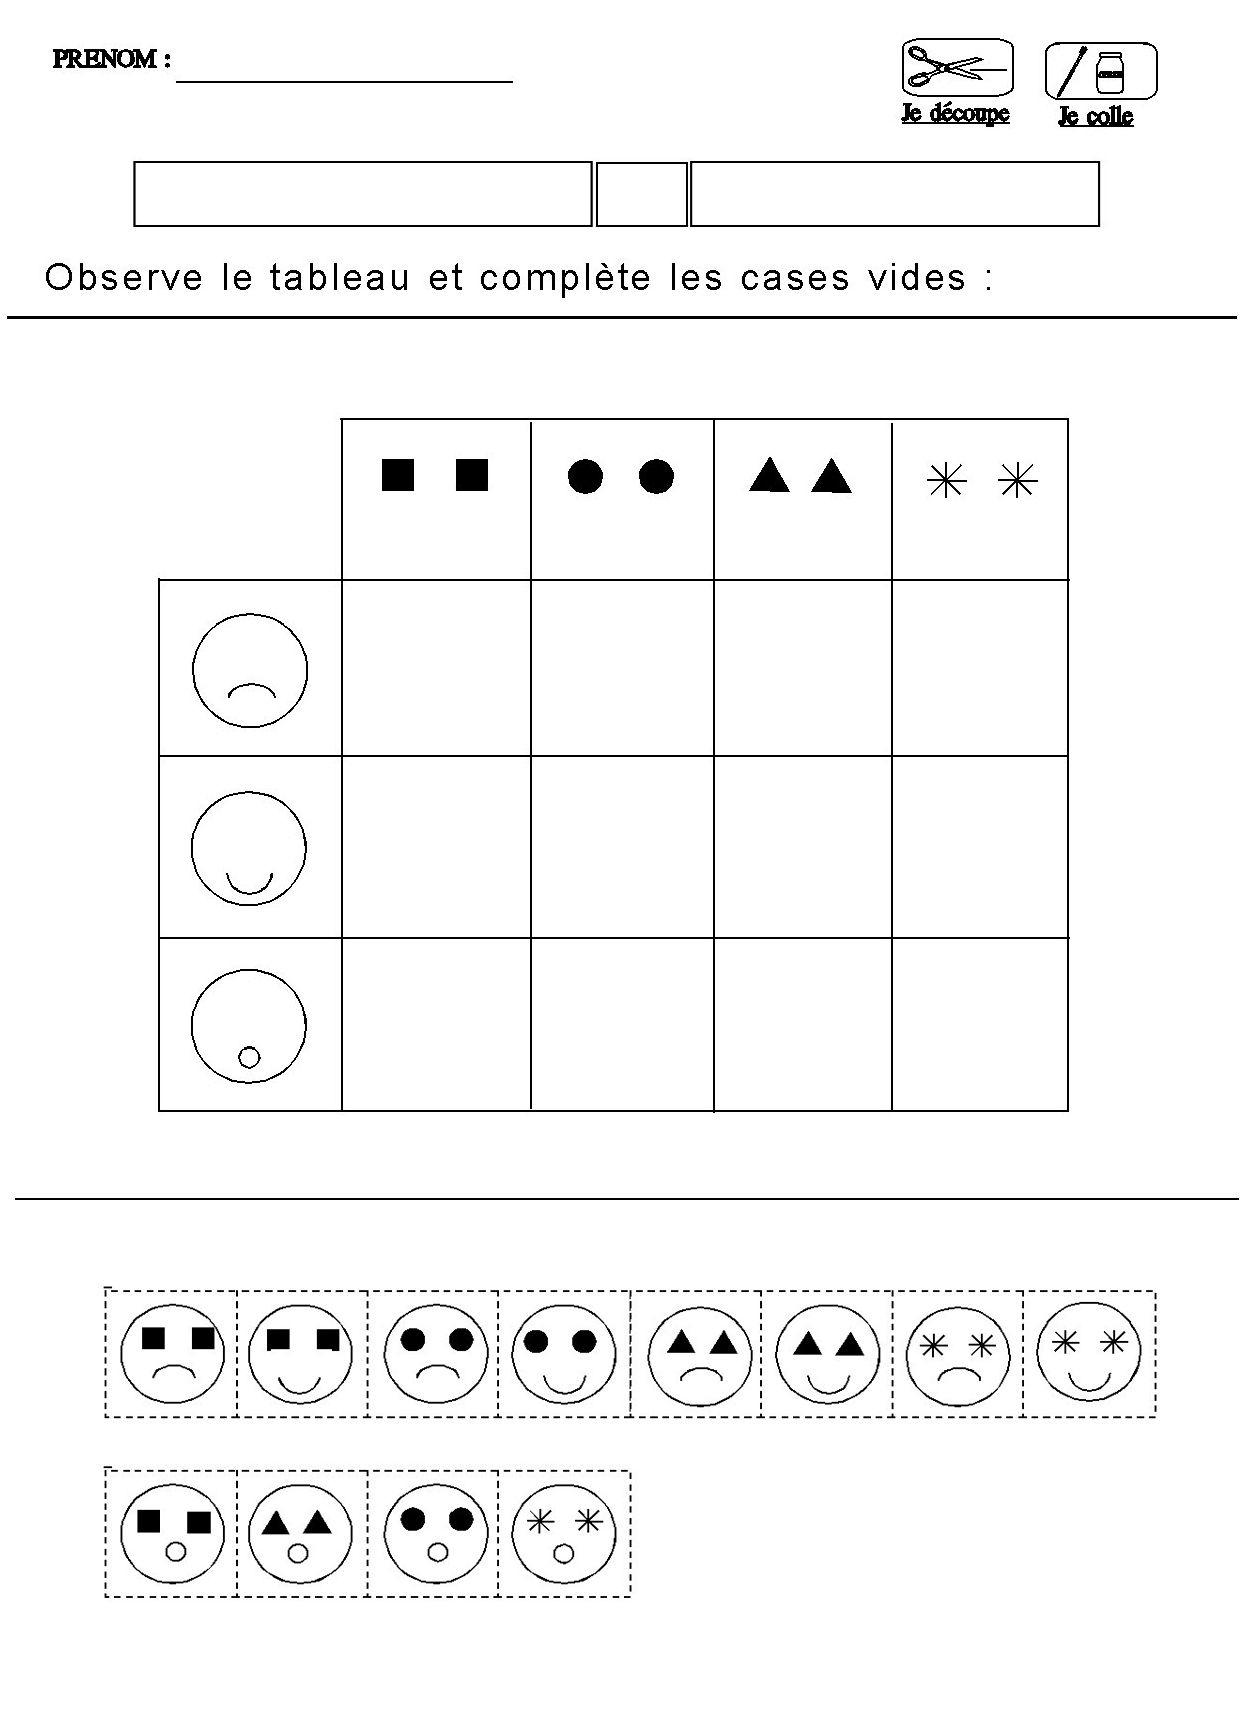 Tableau Double Entrees Pour Maternelle Moyenne Section à Exercice Pour Maternelle Petite Section